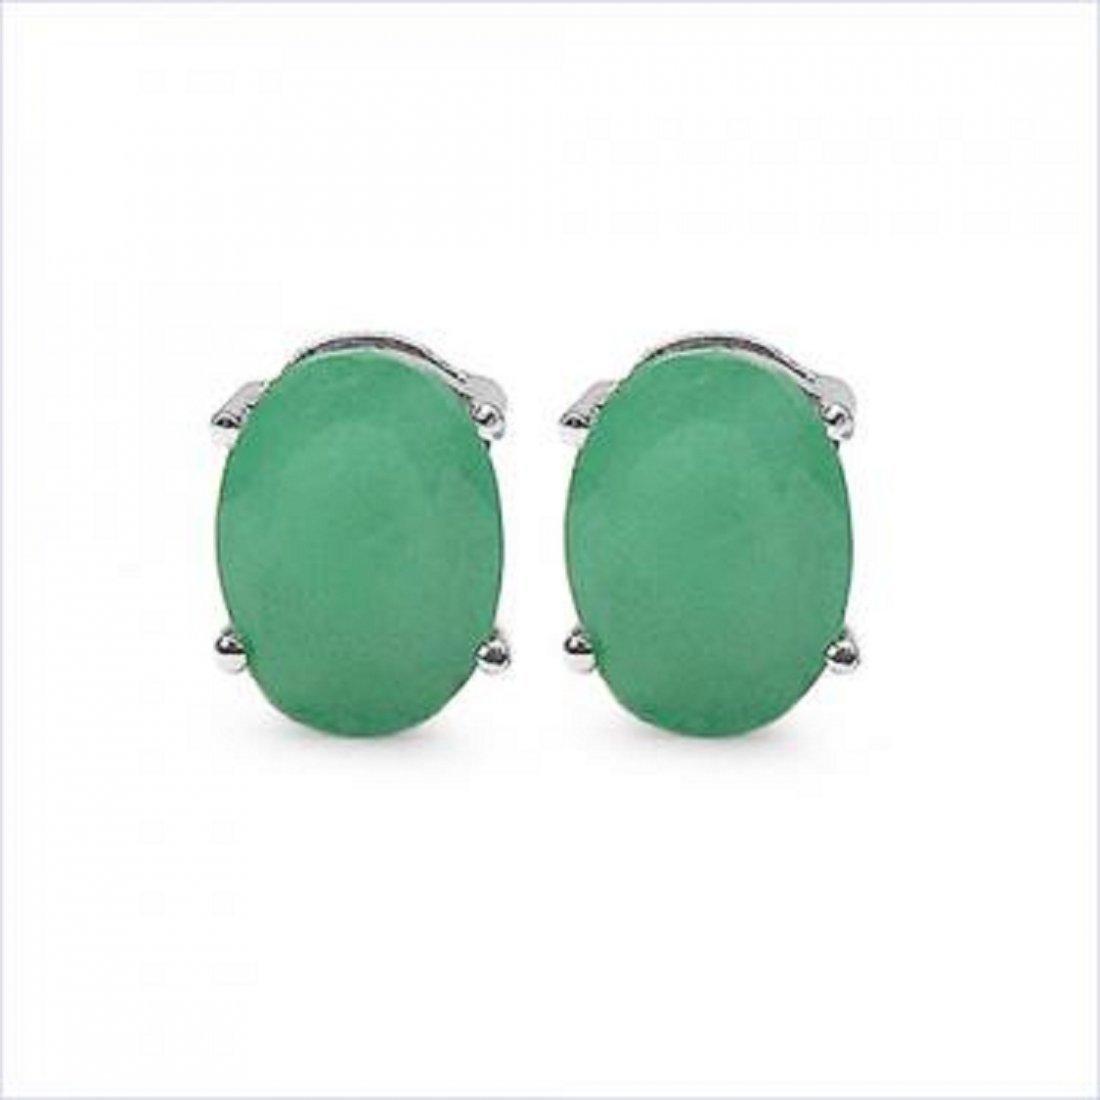 3 CT Cabochon Emerald Stud Earrings